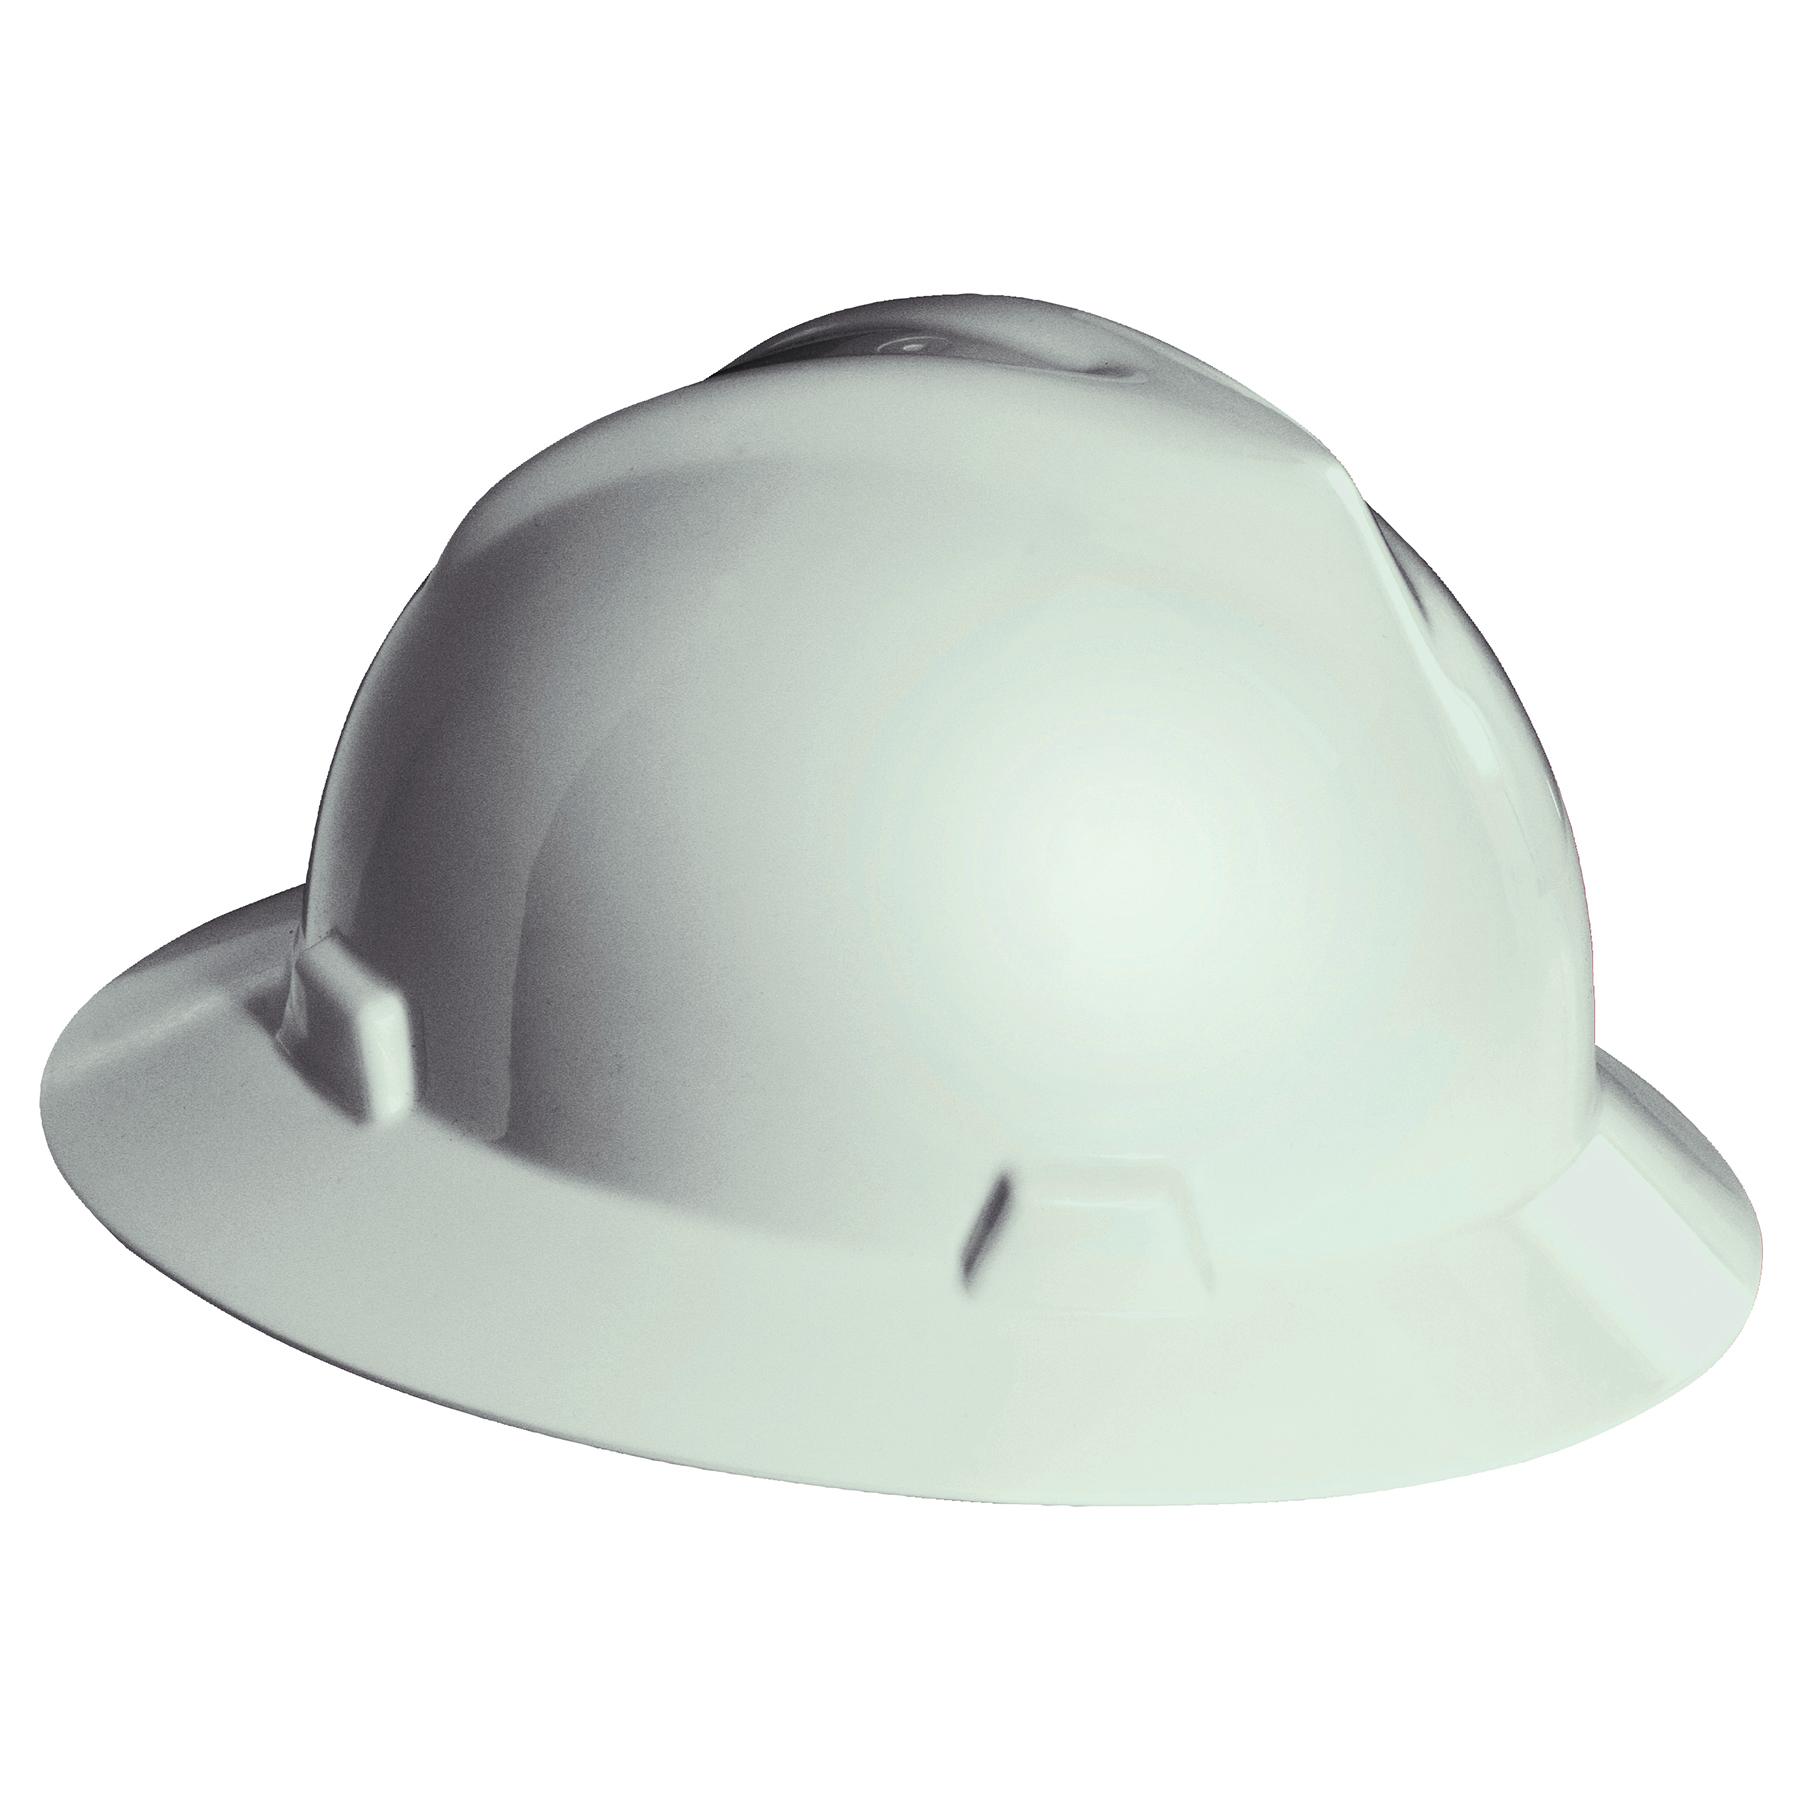 V-Gard® Hard Hat, White - 60028   Klein Tools - For Professionals